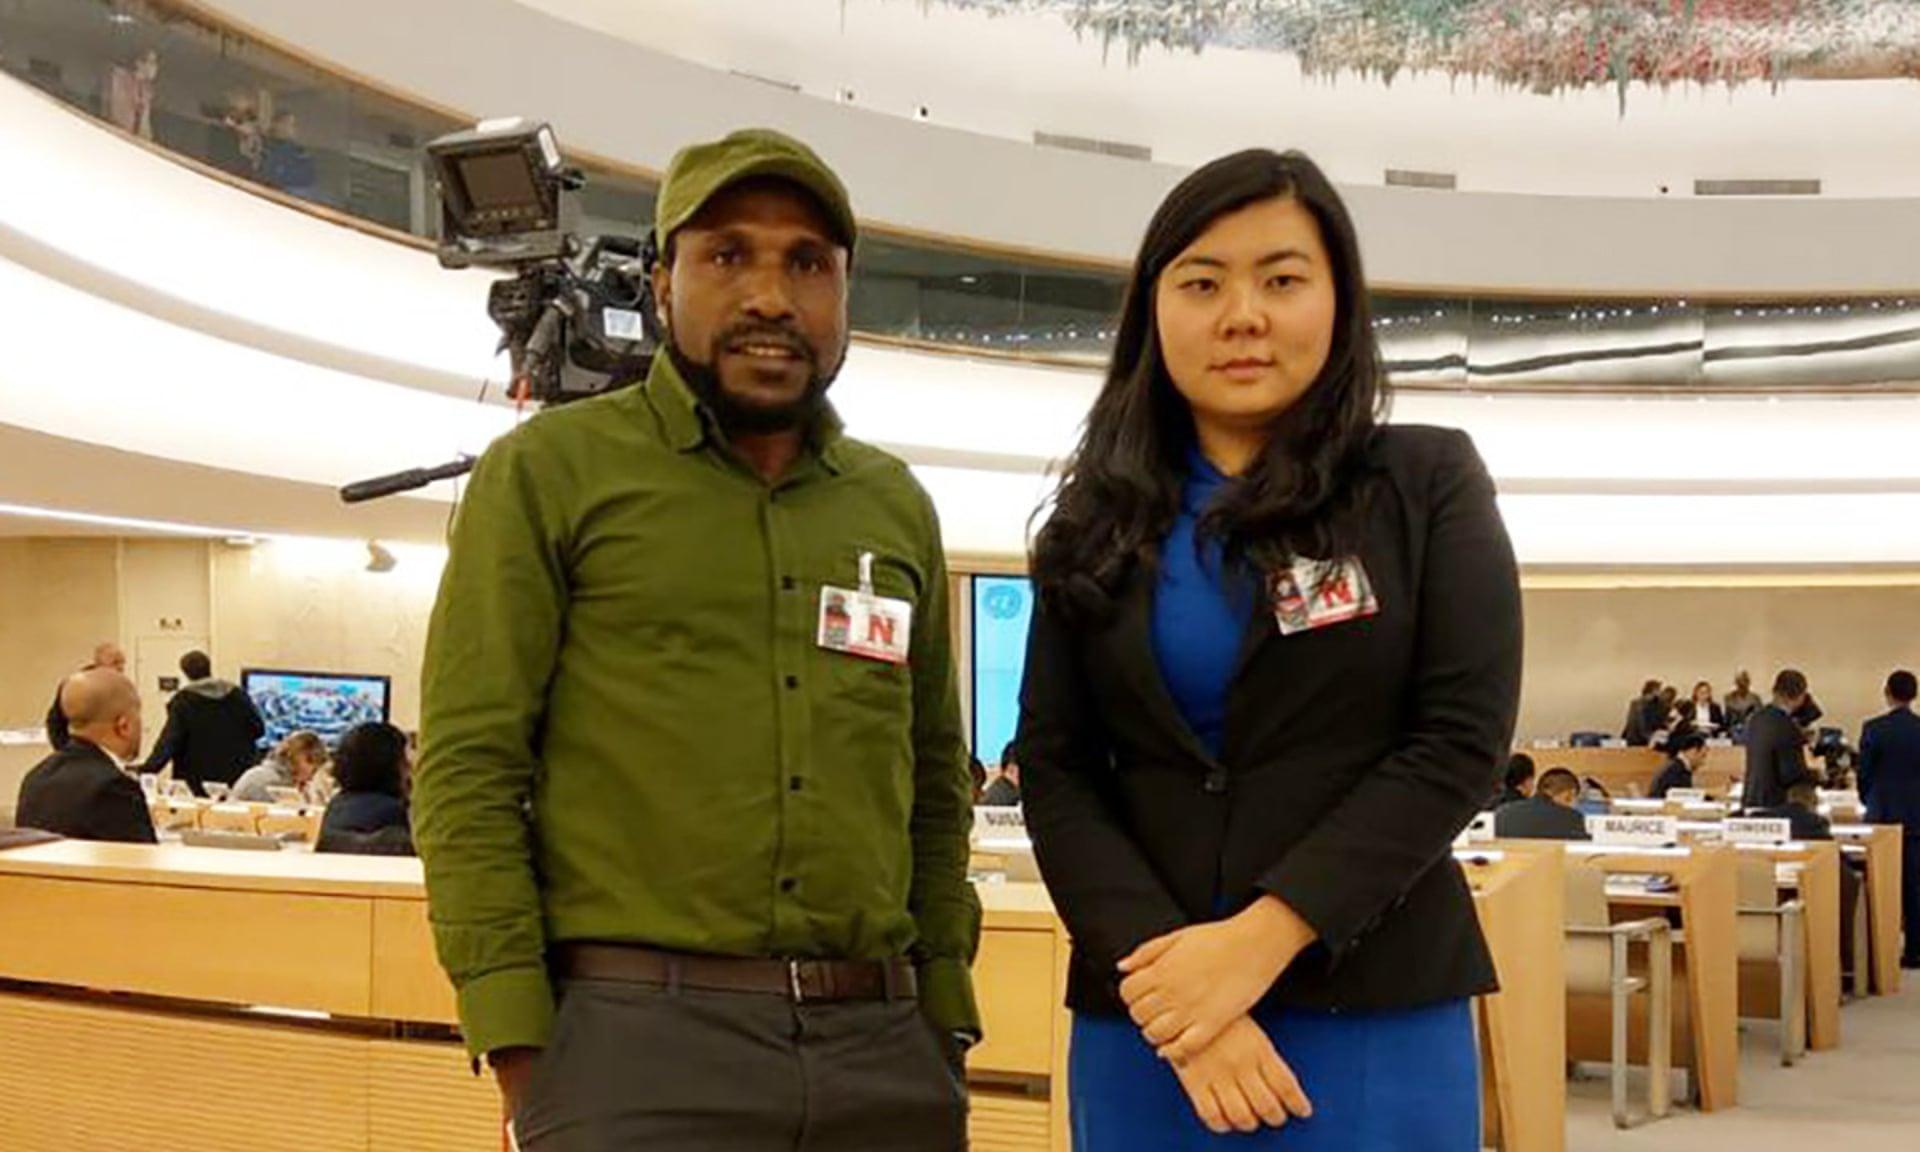 Aktivis Papua Barat Victor Yeimo dan pengacara Indonesia, Veronica Koman, di PBB Jenewa.